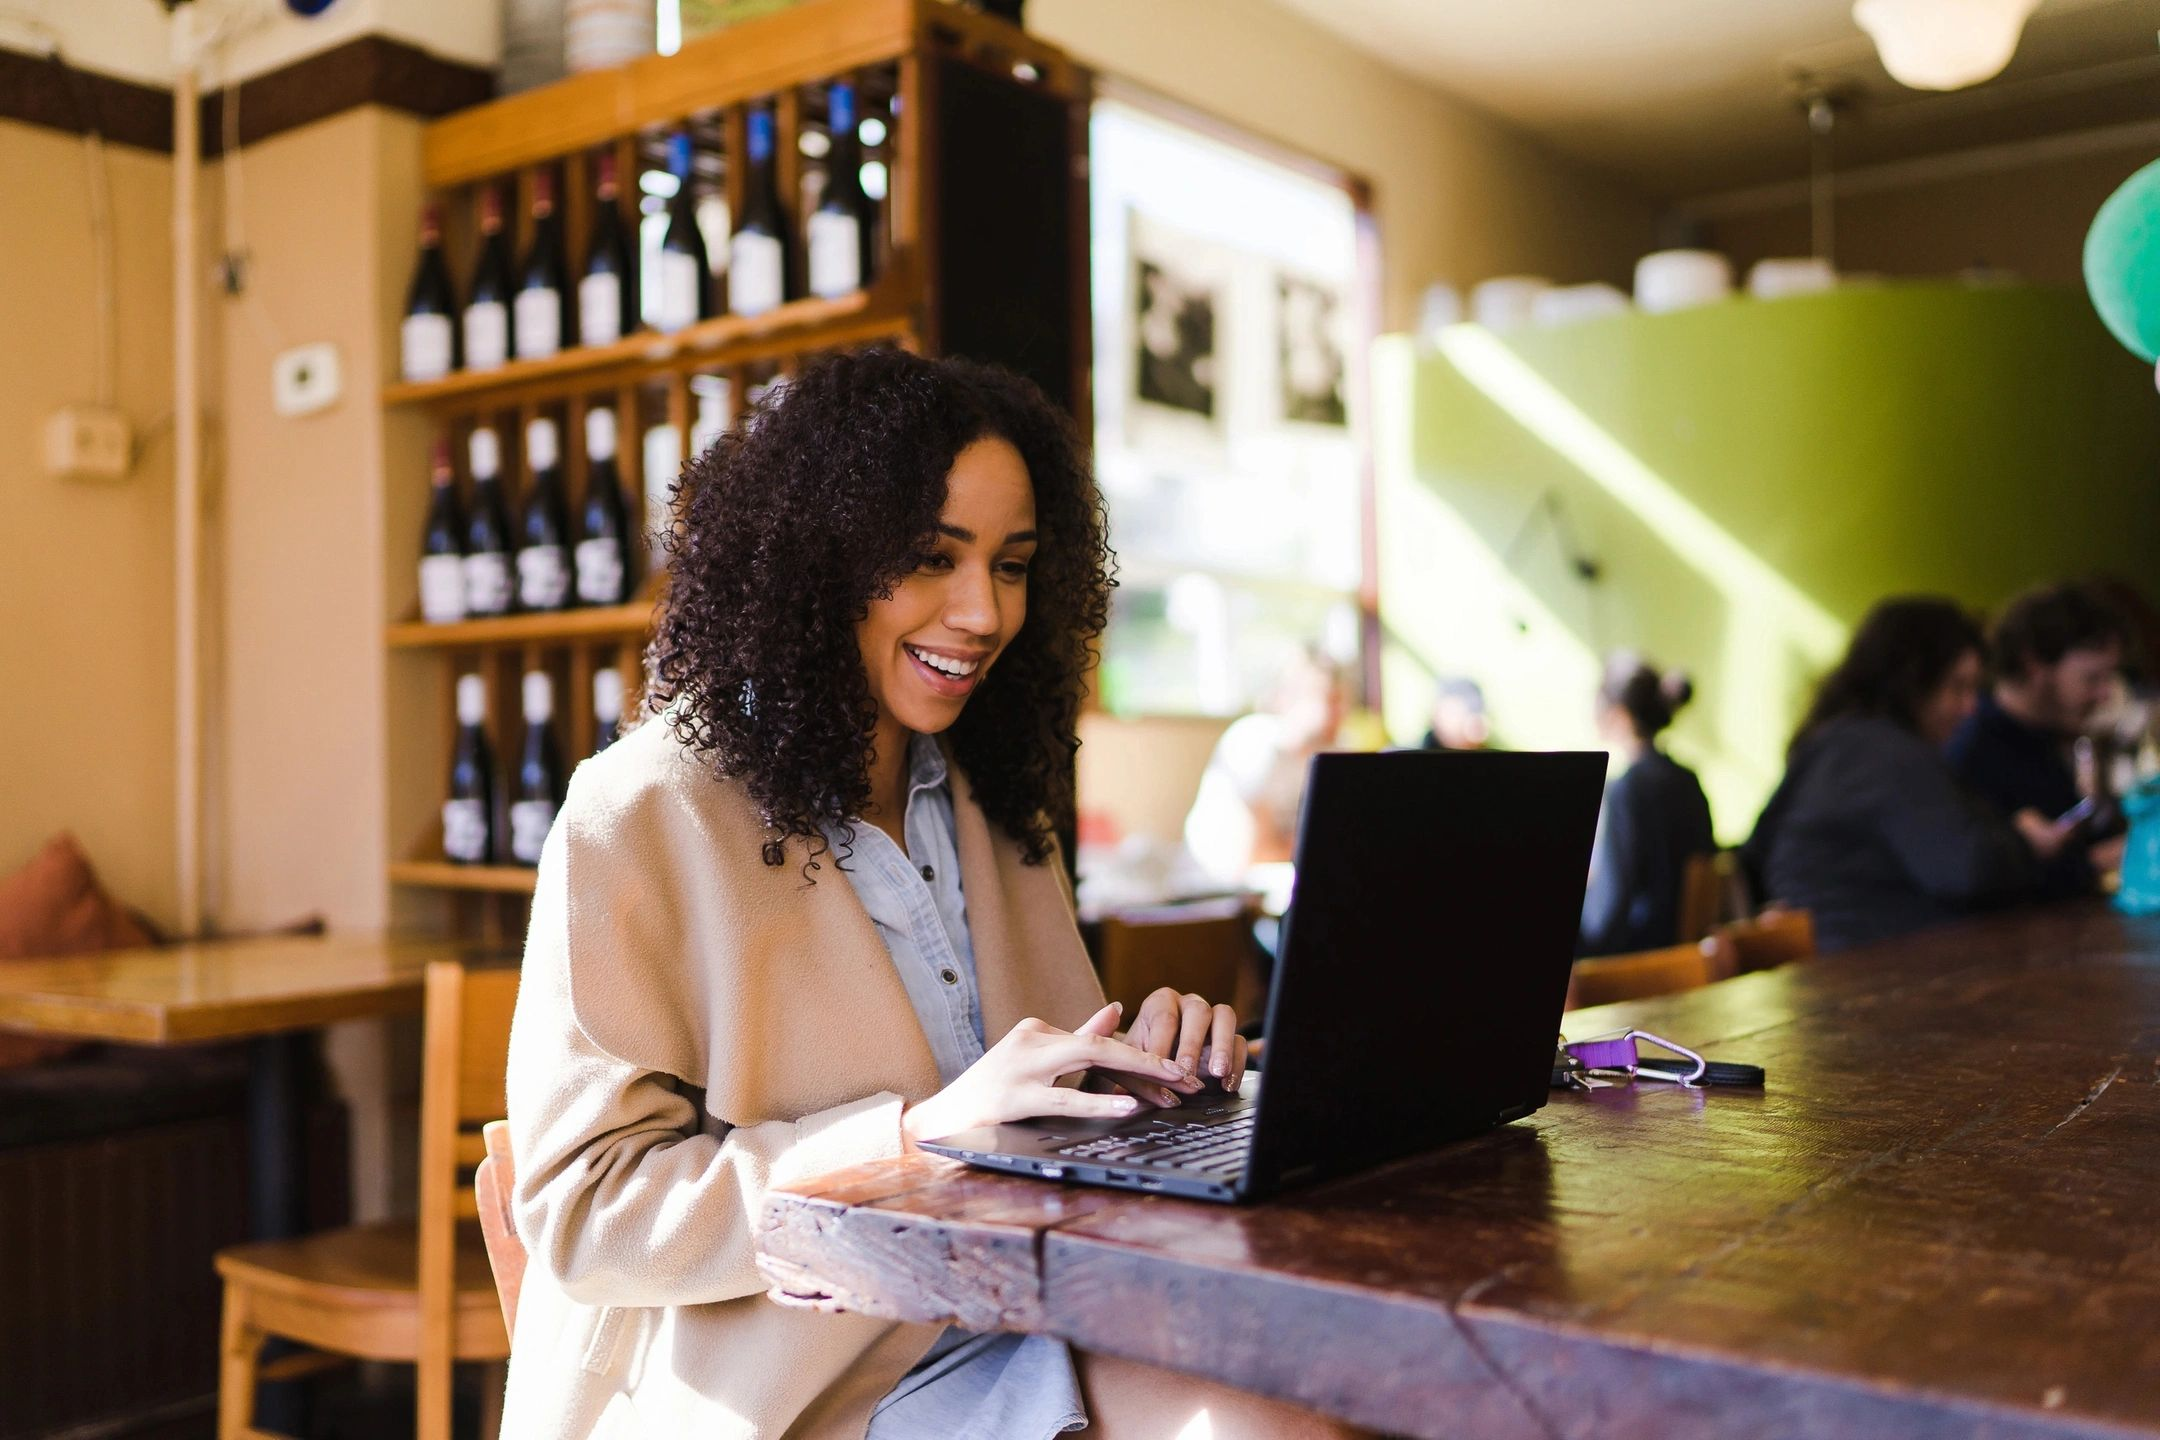 Why A Side Hustle Should Run Itself